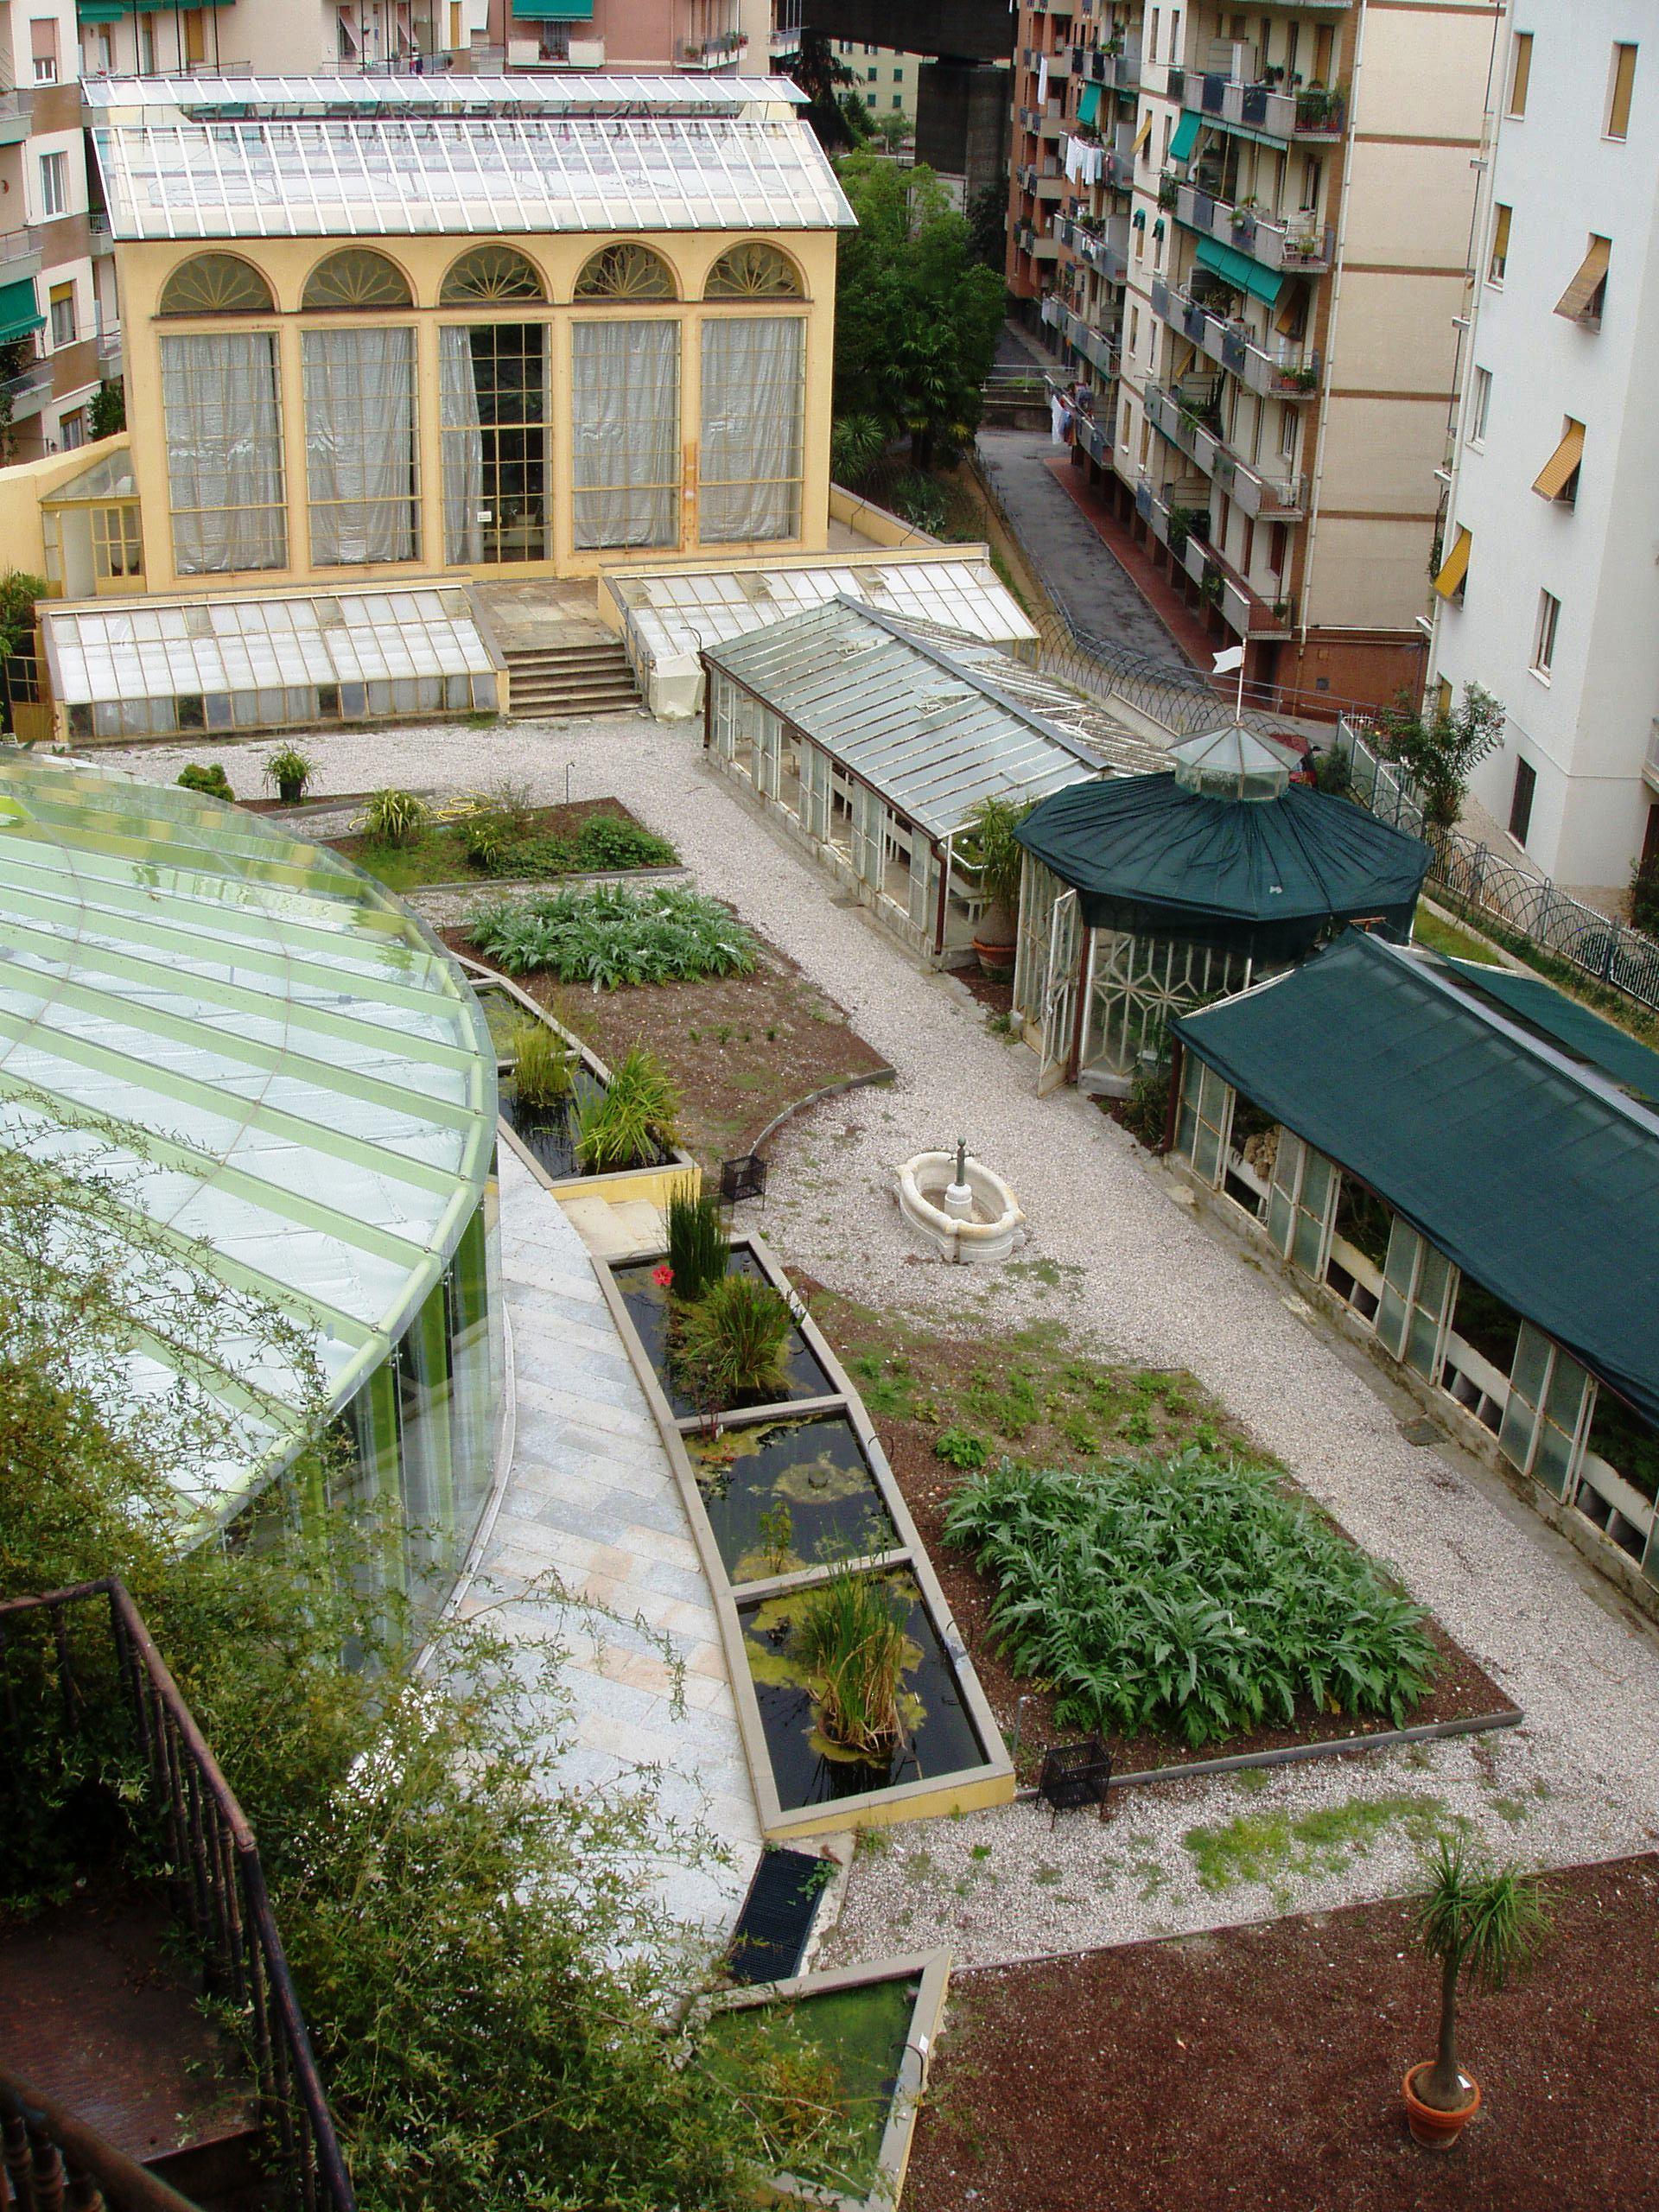 giardino-botanico-clelia-durazzo